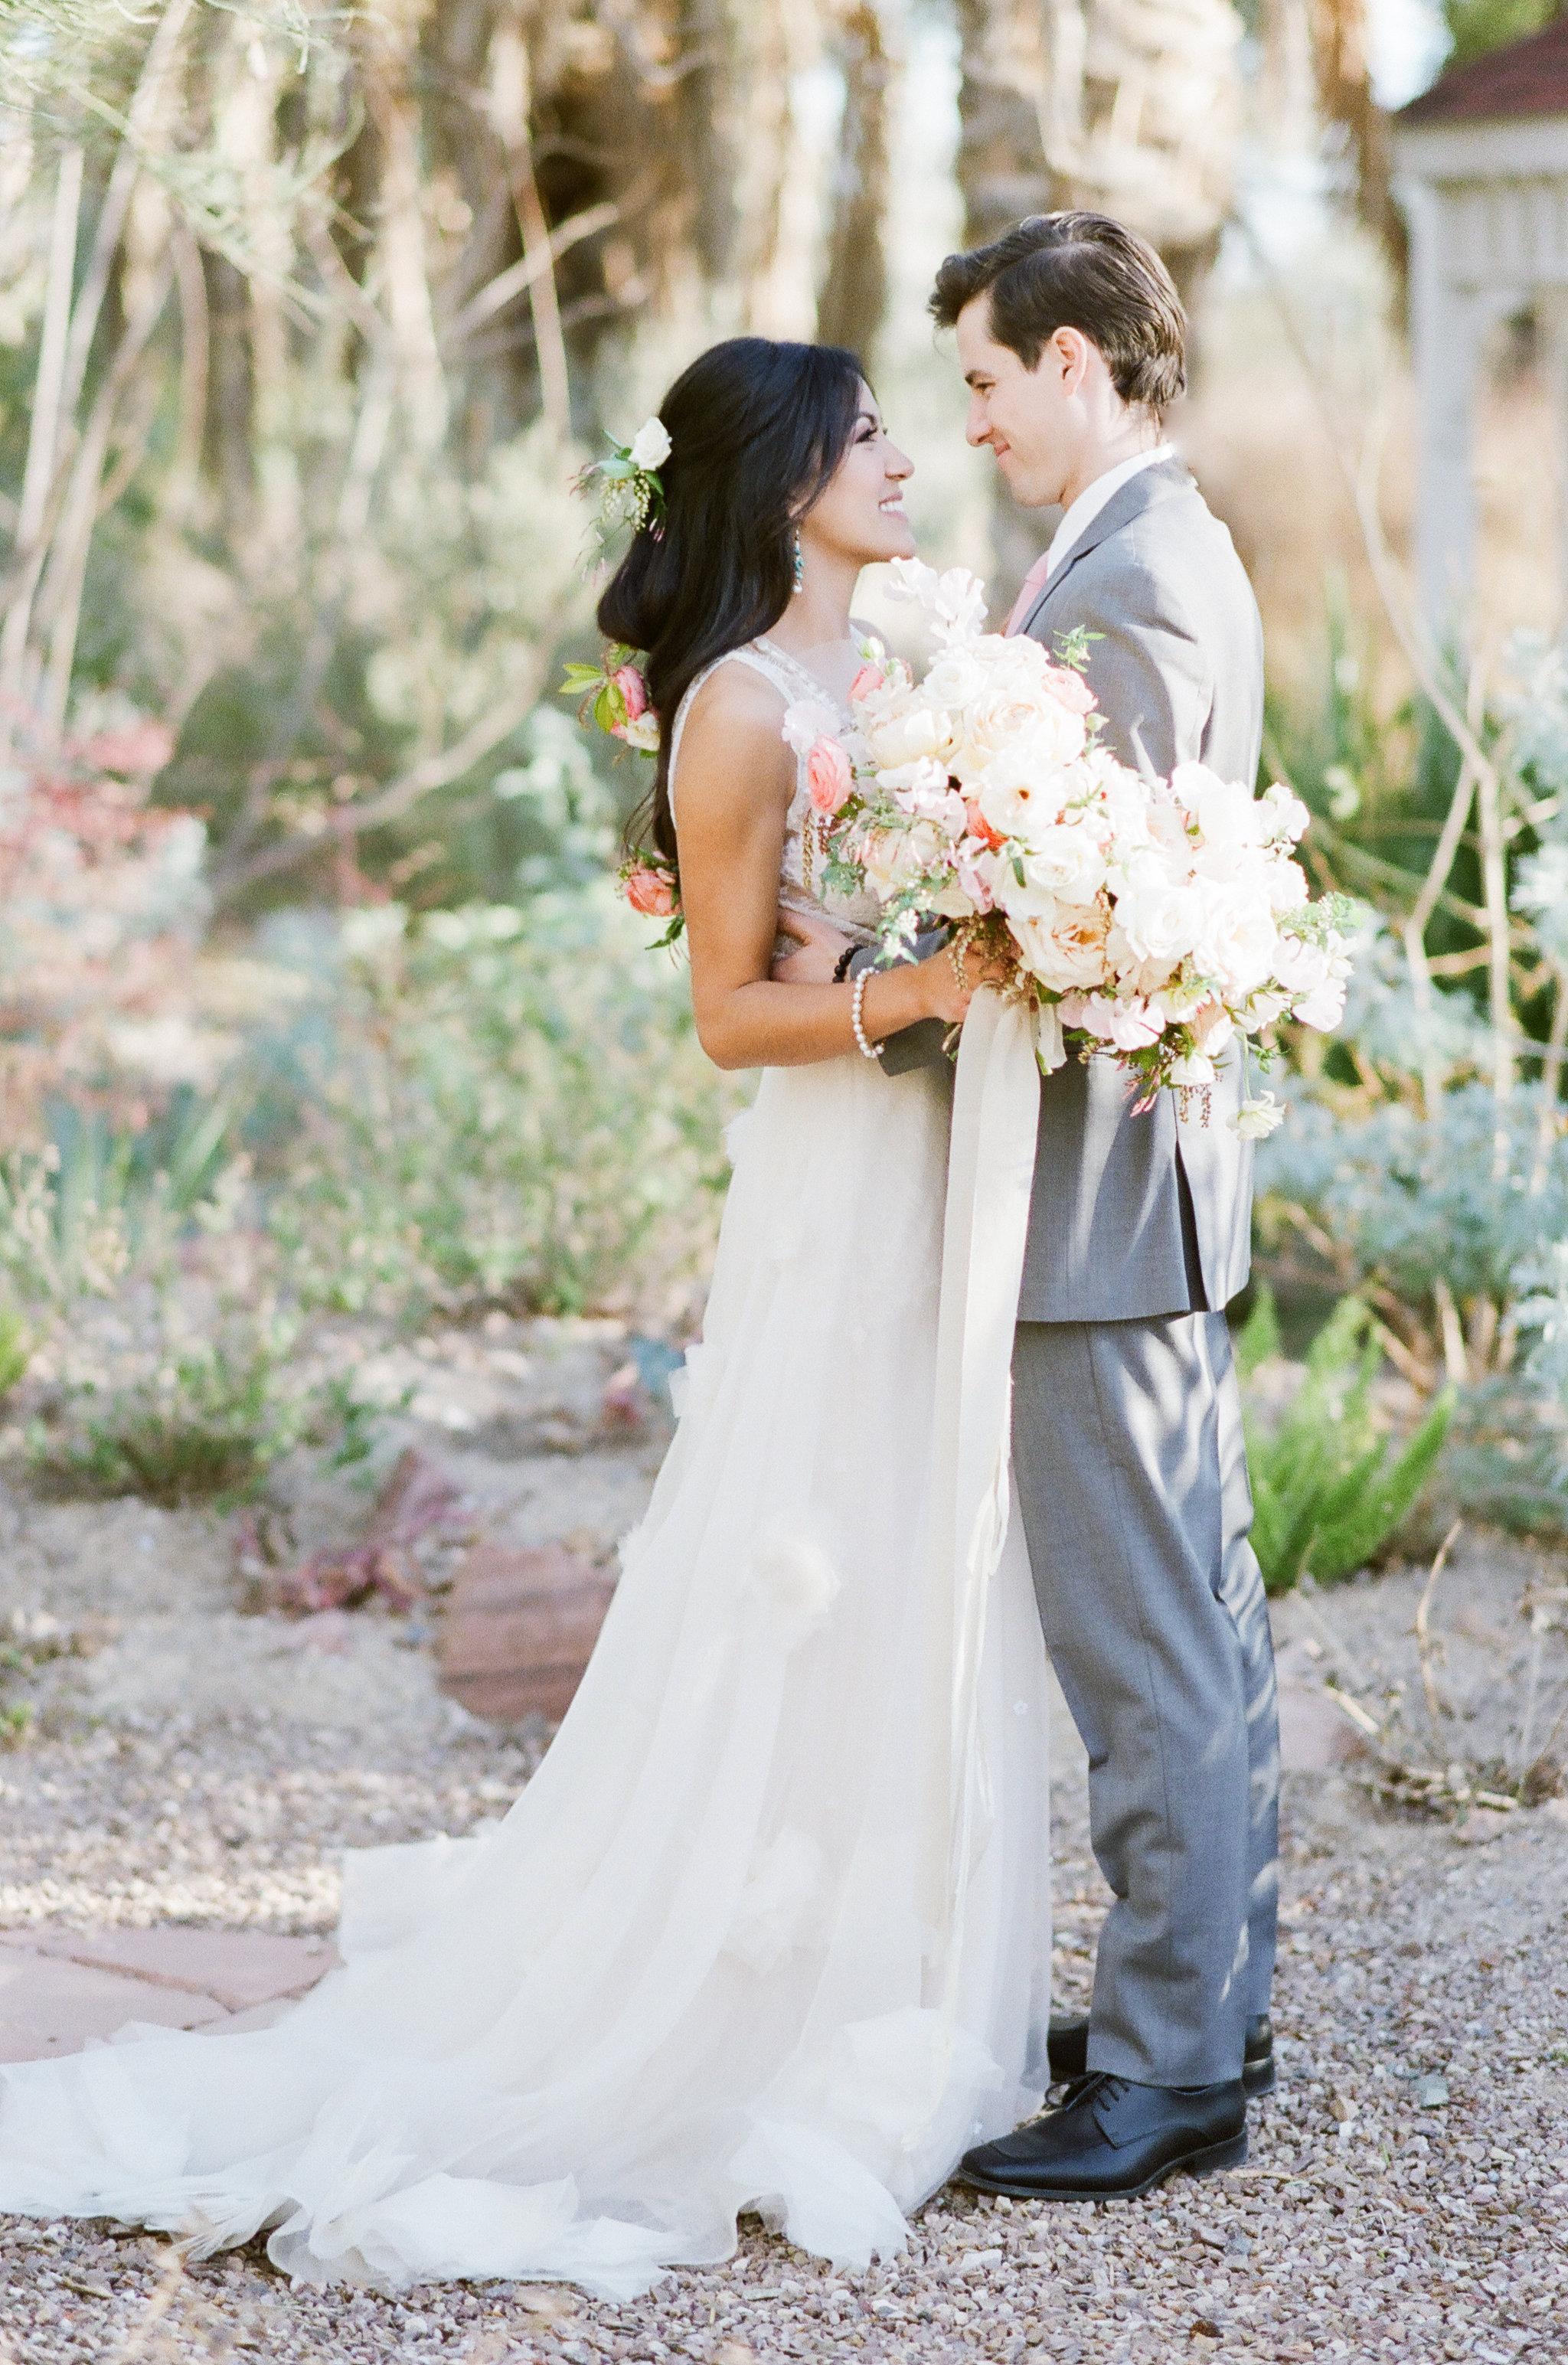 Taken on our wedding day. Feb 28, 2018